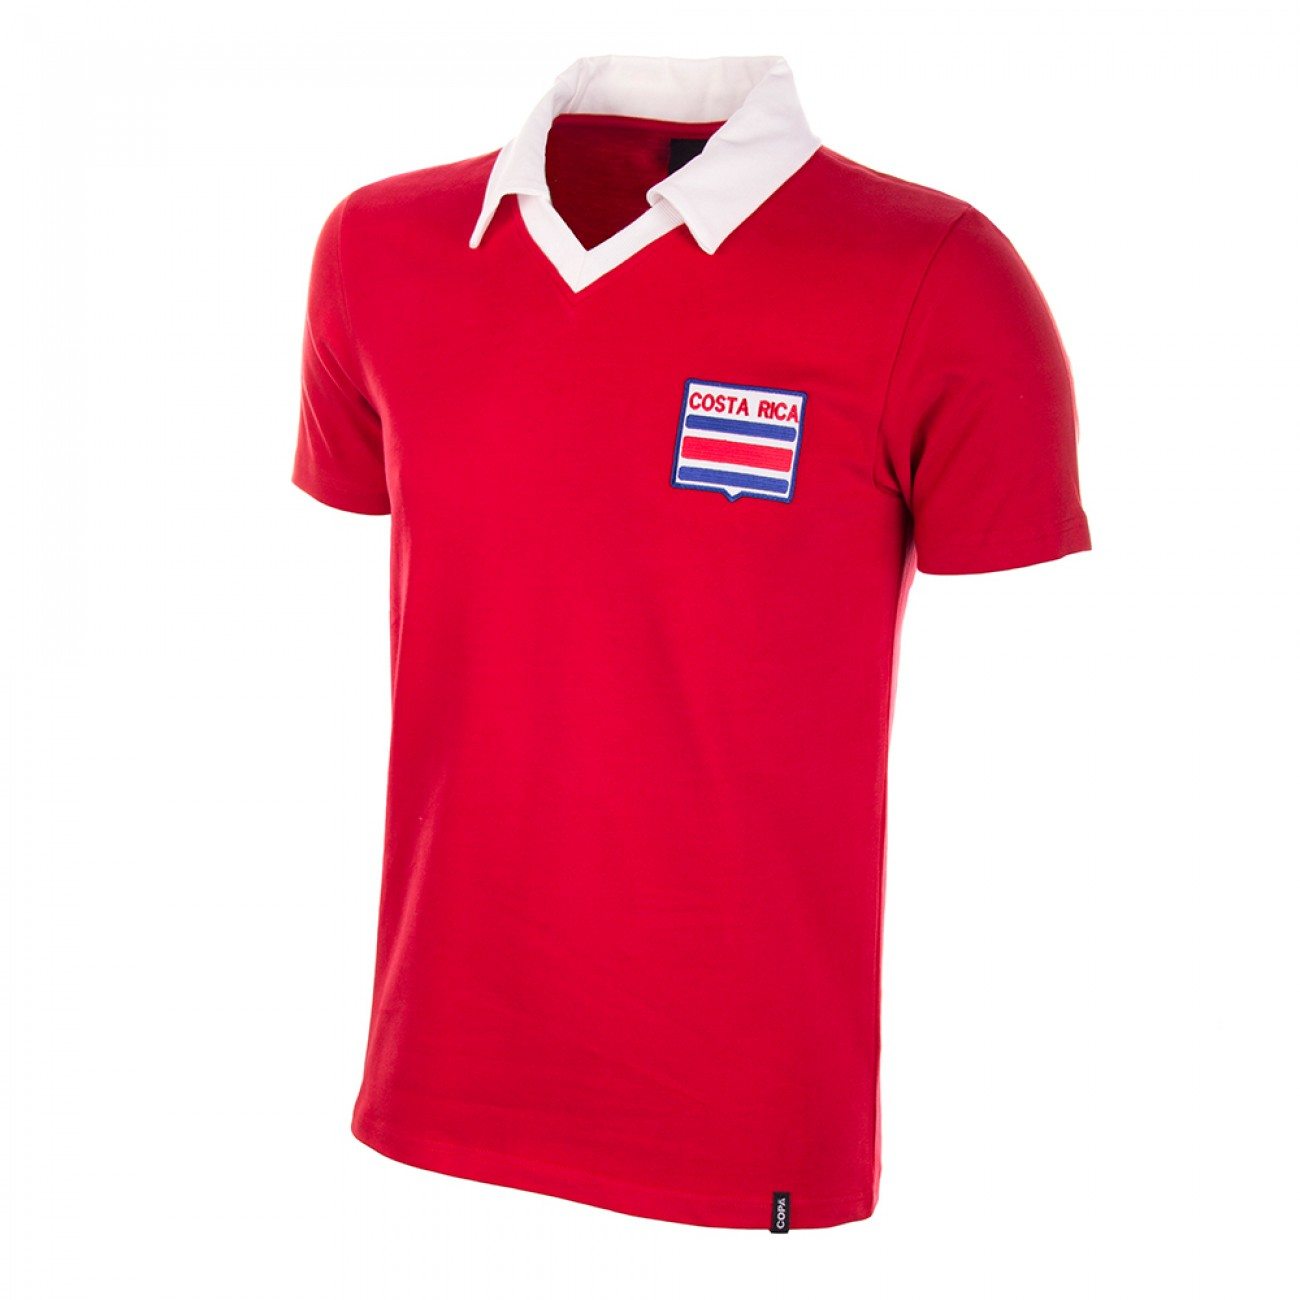 http://www.retrofootball.es/ropa-de-futbol/camiseta-costa-rica-1988.html